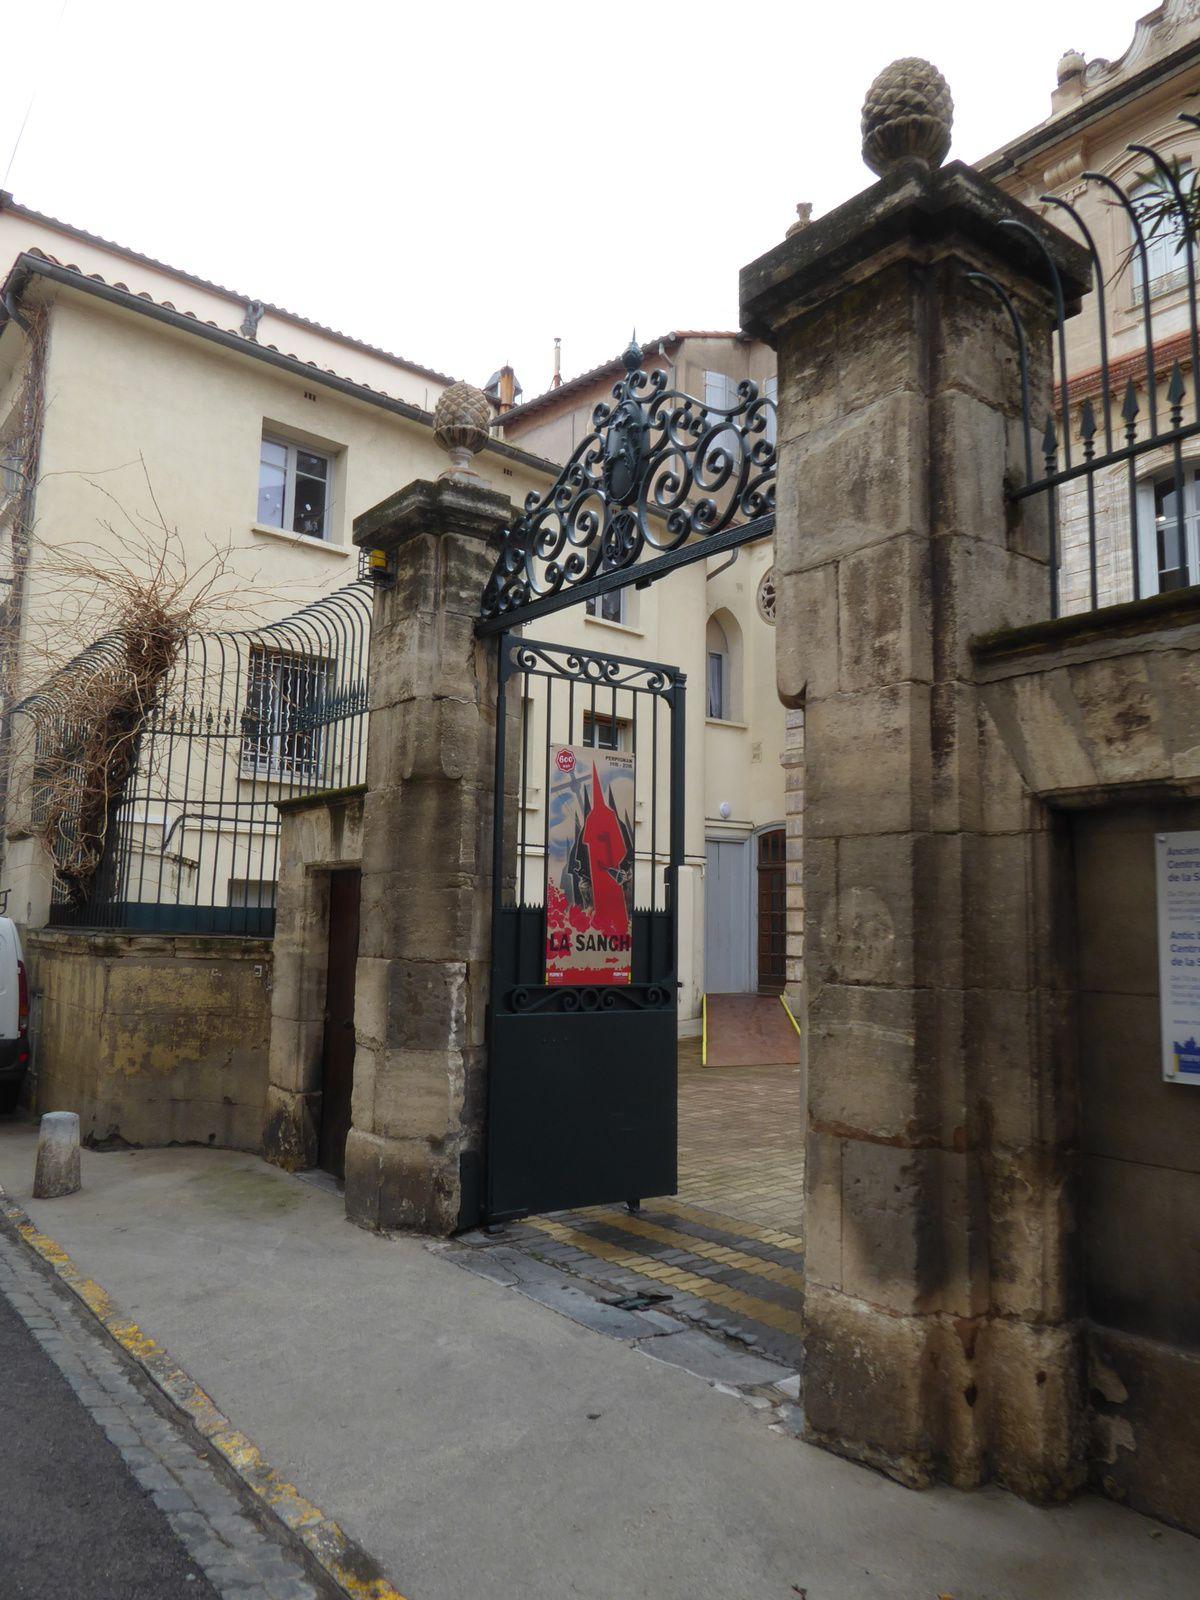 perpignan, expo &quot&#x3B;les 600 ans de la Confrérie de la Sanch&quot&#x3B; 2016